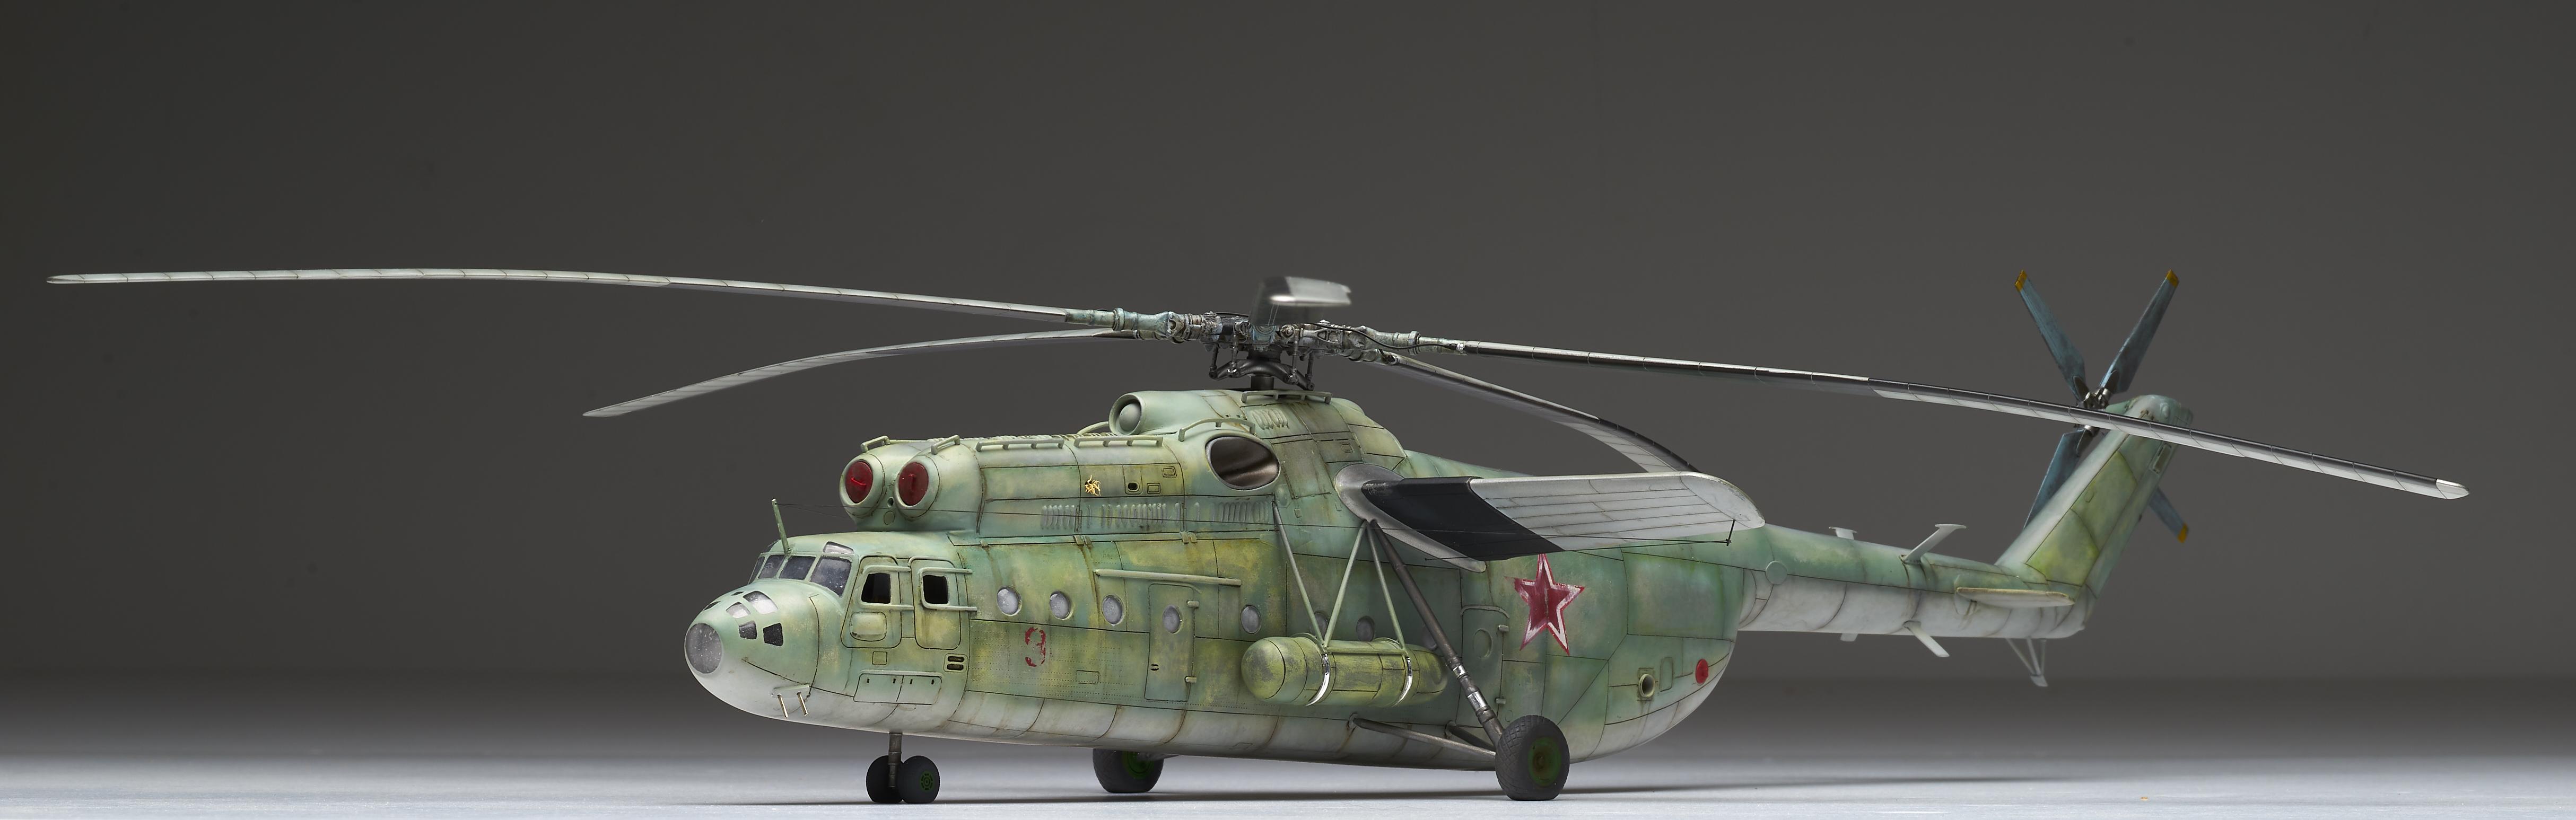 1/72 Amodel Mi-6